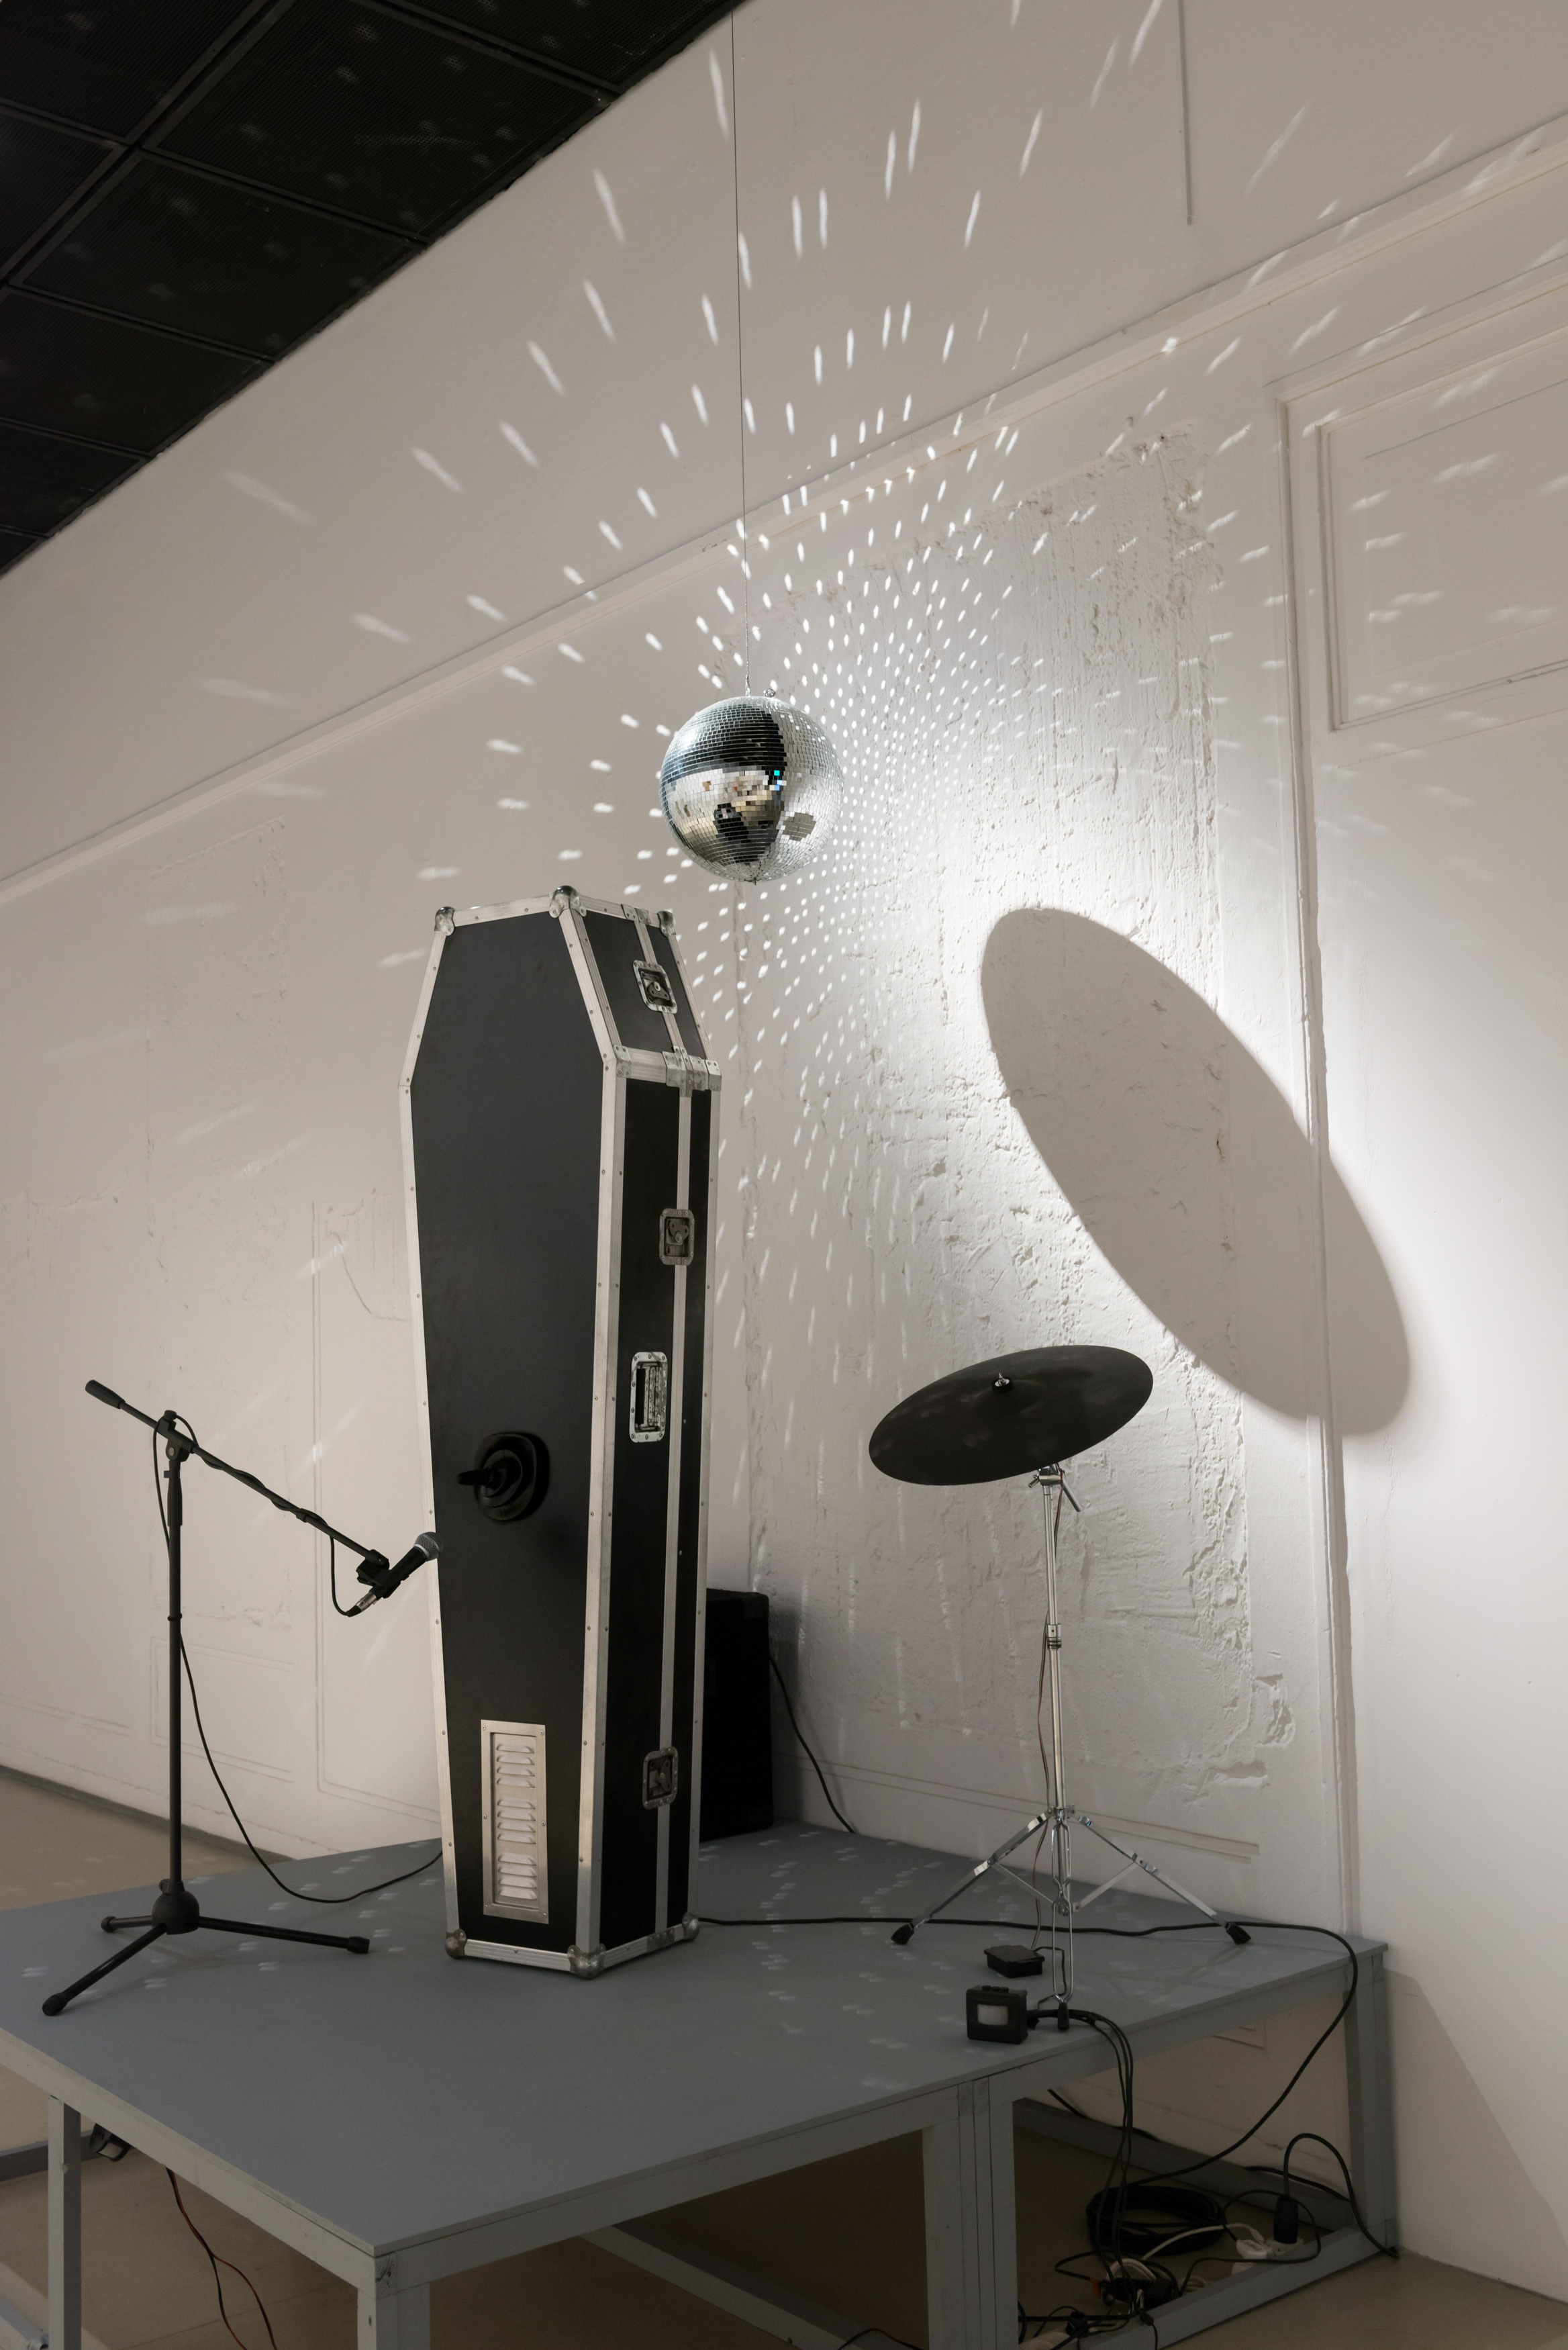 Leszek Knaflewski, Born toPlay, 2003, instalacja